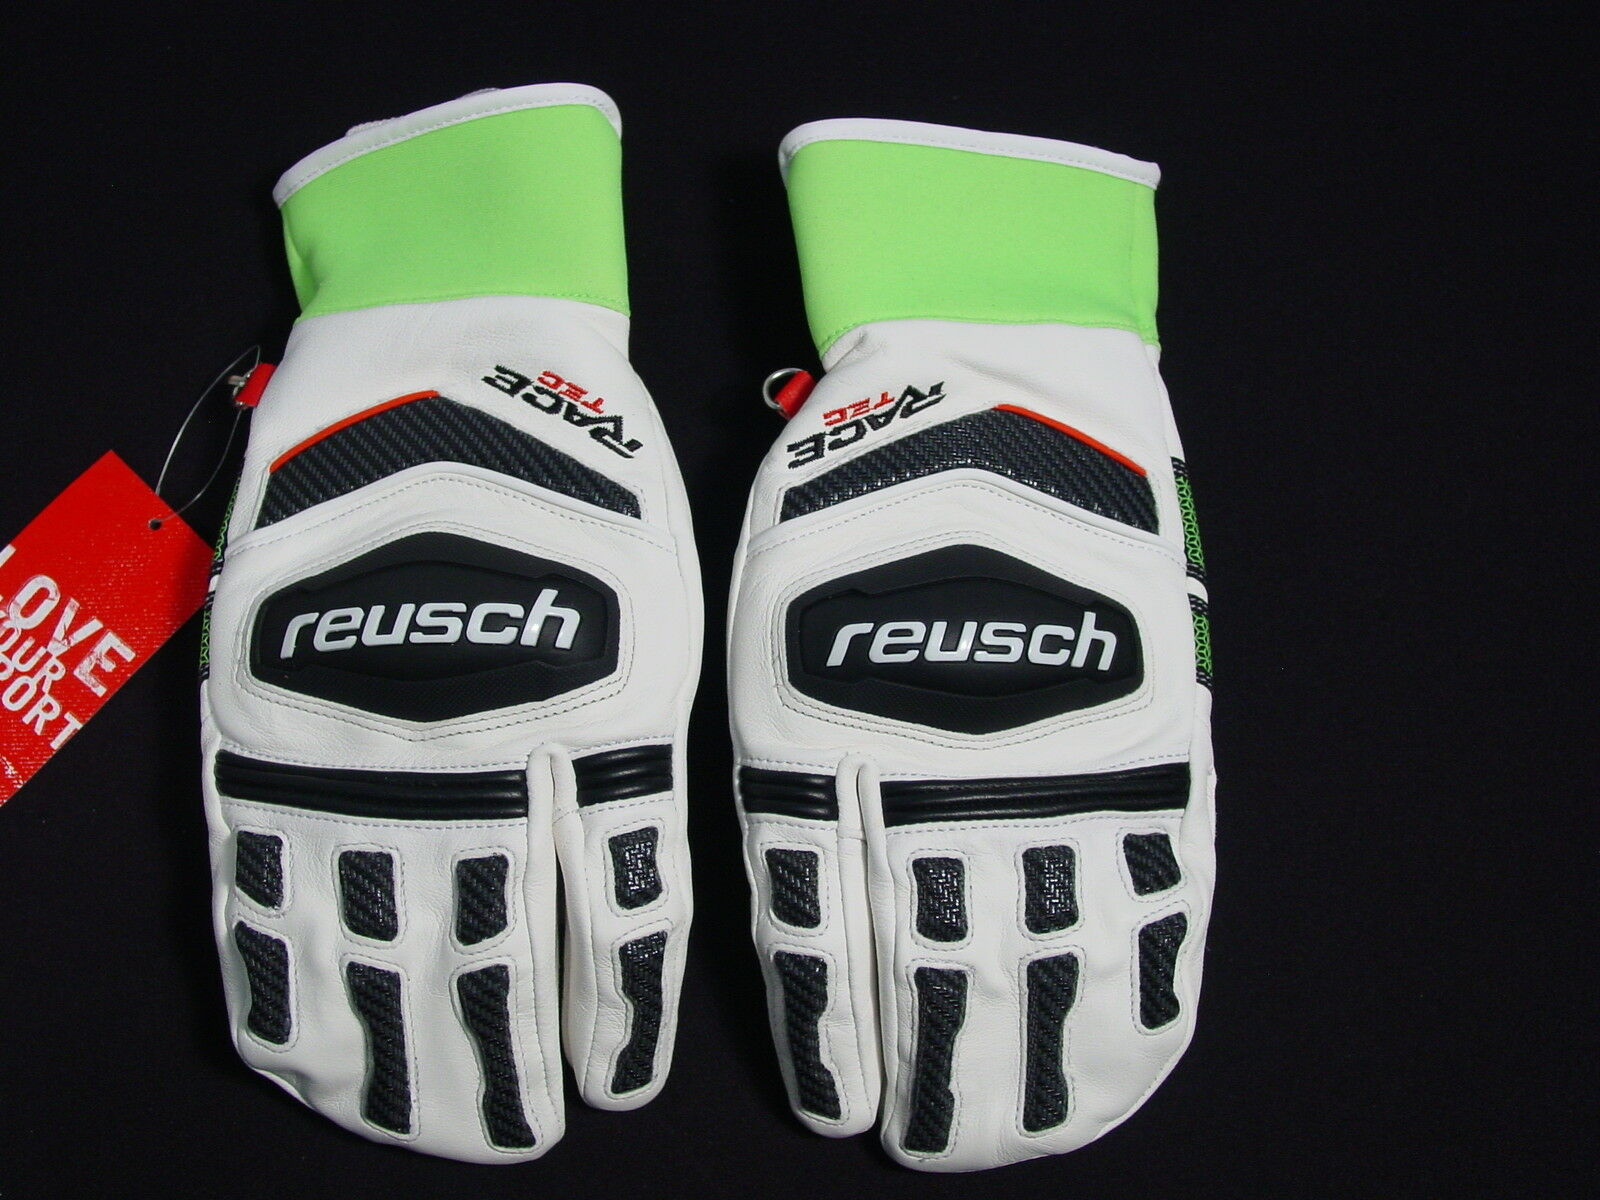 Reusch ALL LEATHER RaceTec 16 Racing Ski LOBSTER Mittens Adult Medium 4611715S